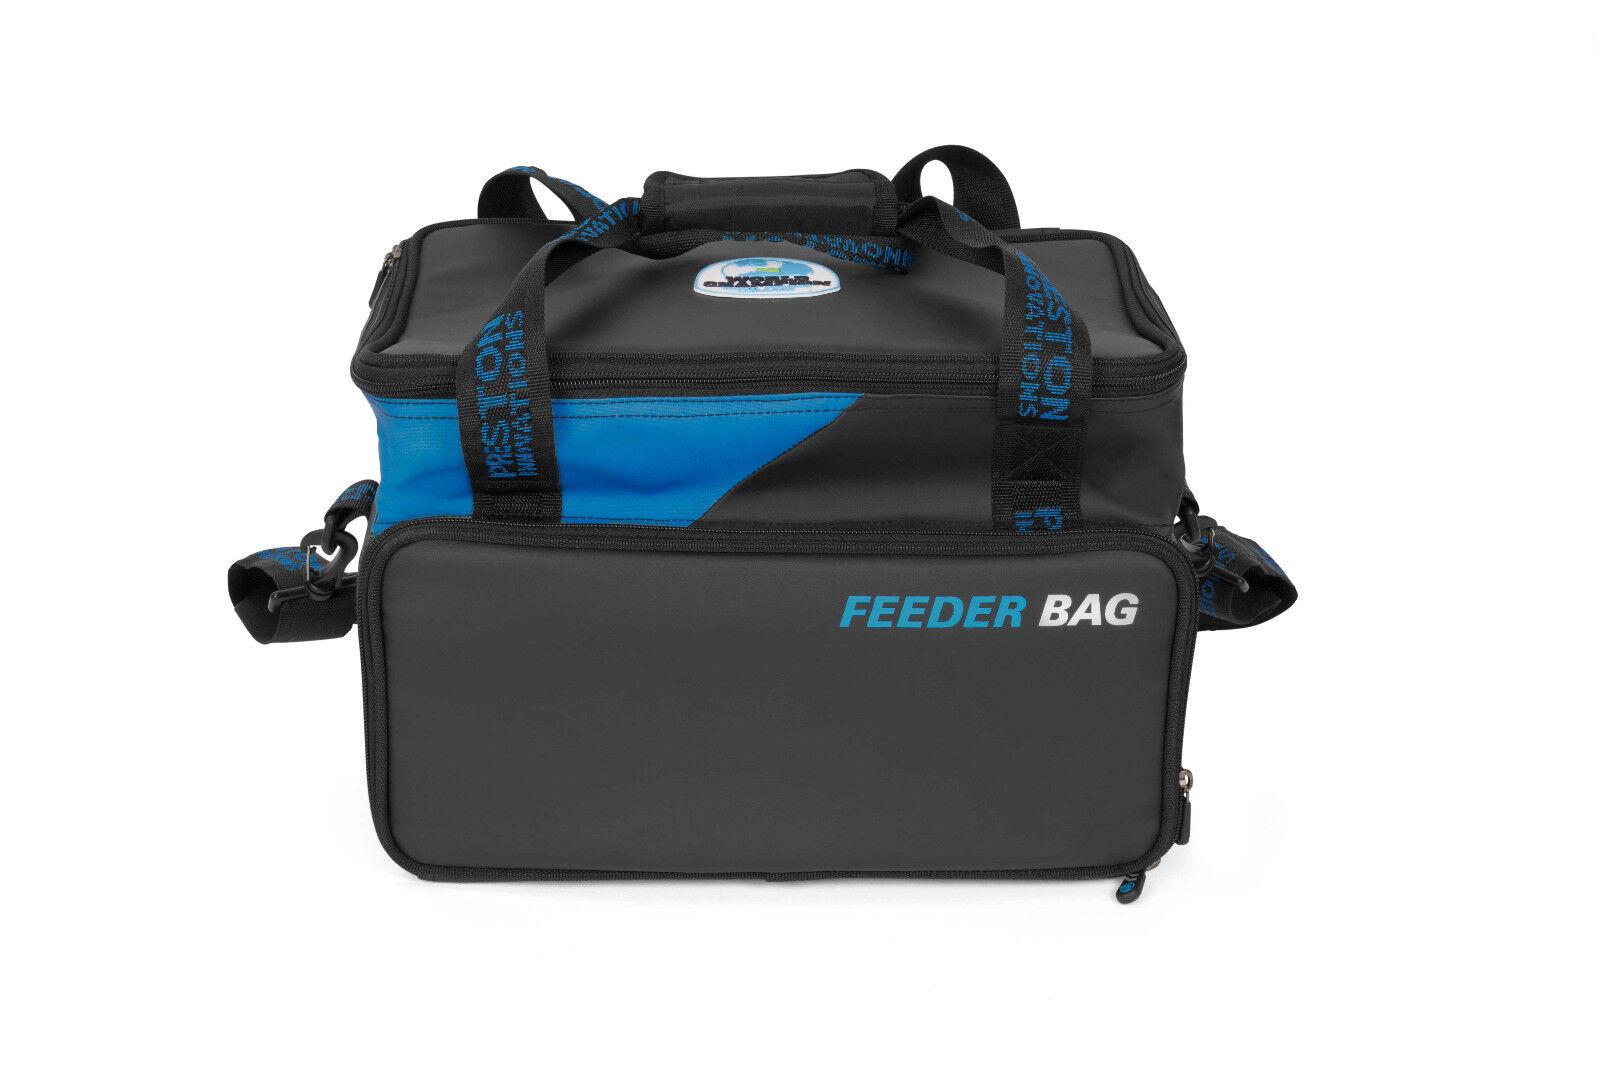 Preston Innovations World Champion - Feeder Bag